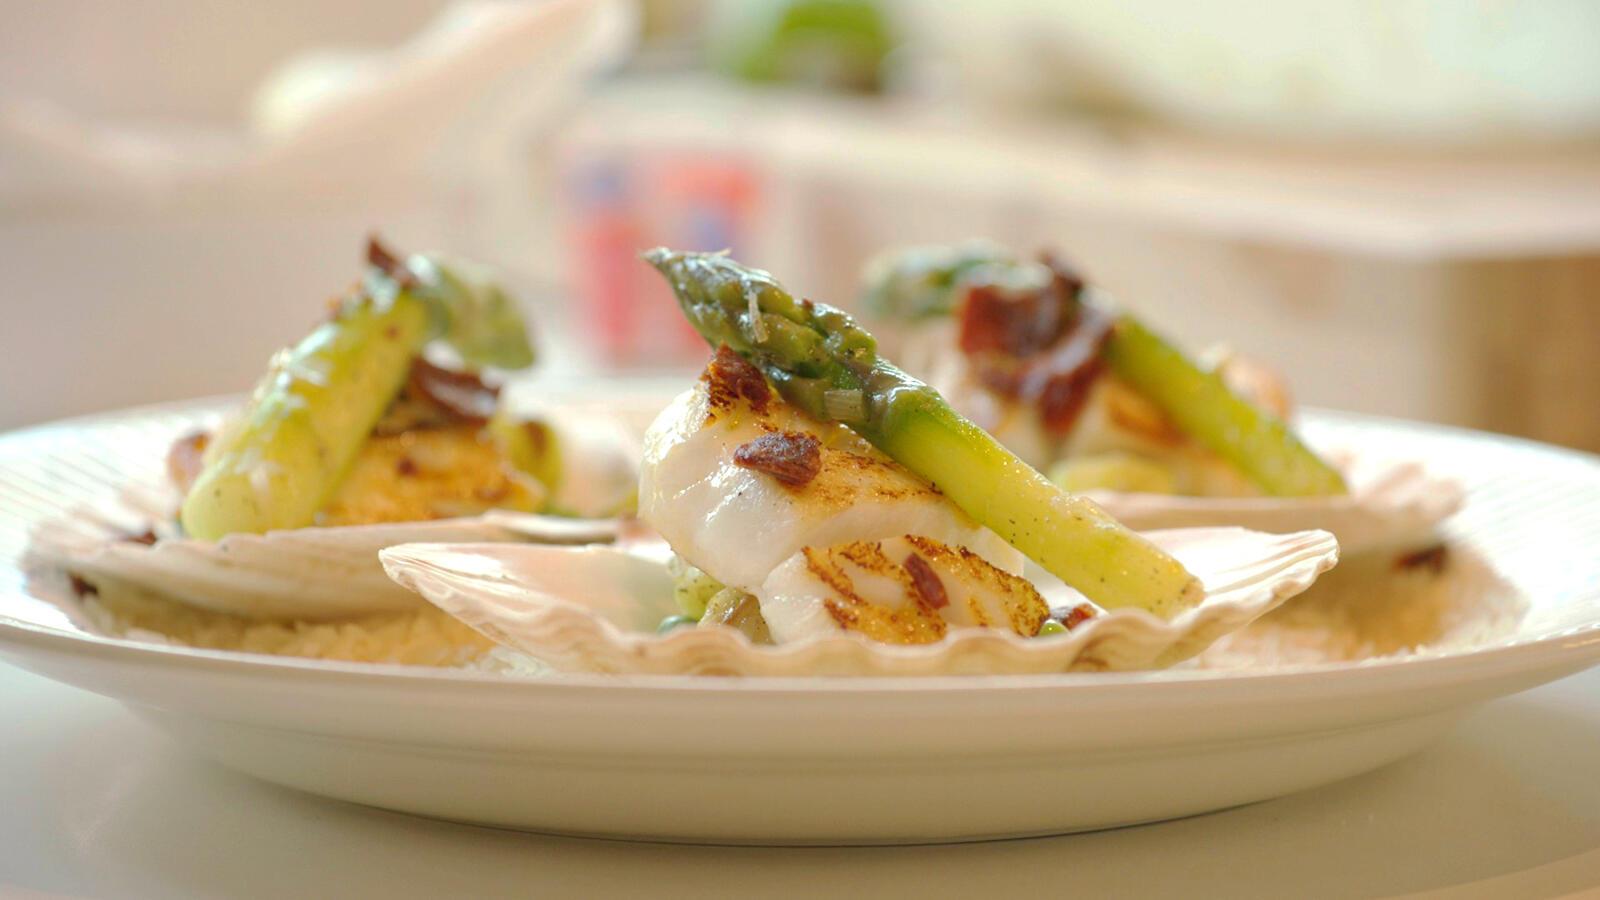 Lamsballetjes met bloemkoolcouscous, taco van parmezaan met rundertartaar en kabeljauw met groene asperges